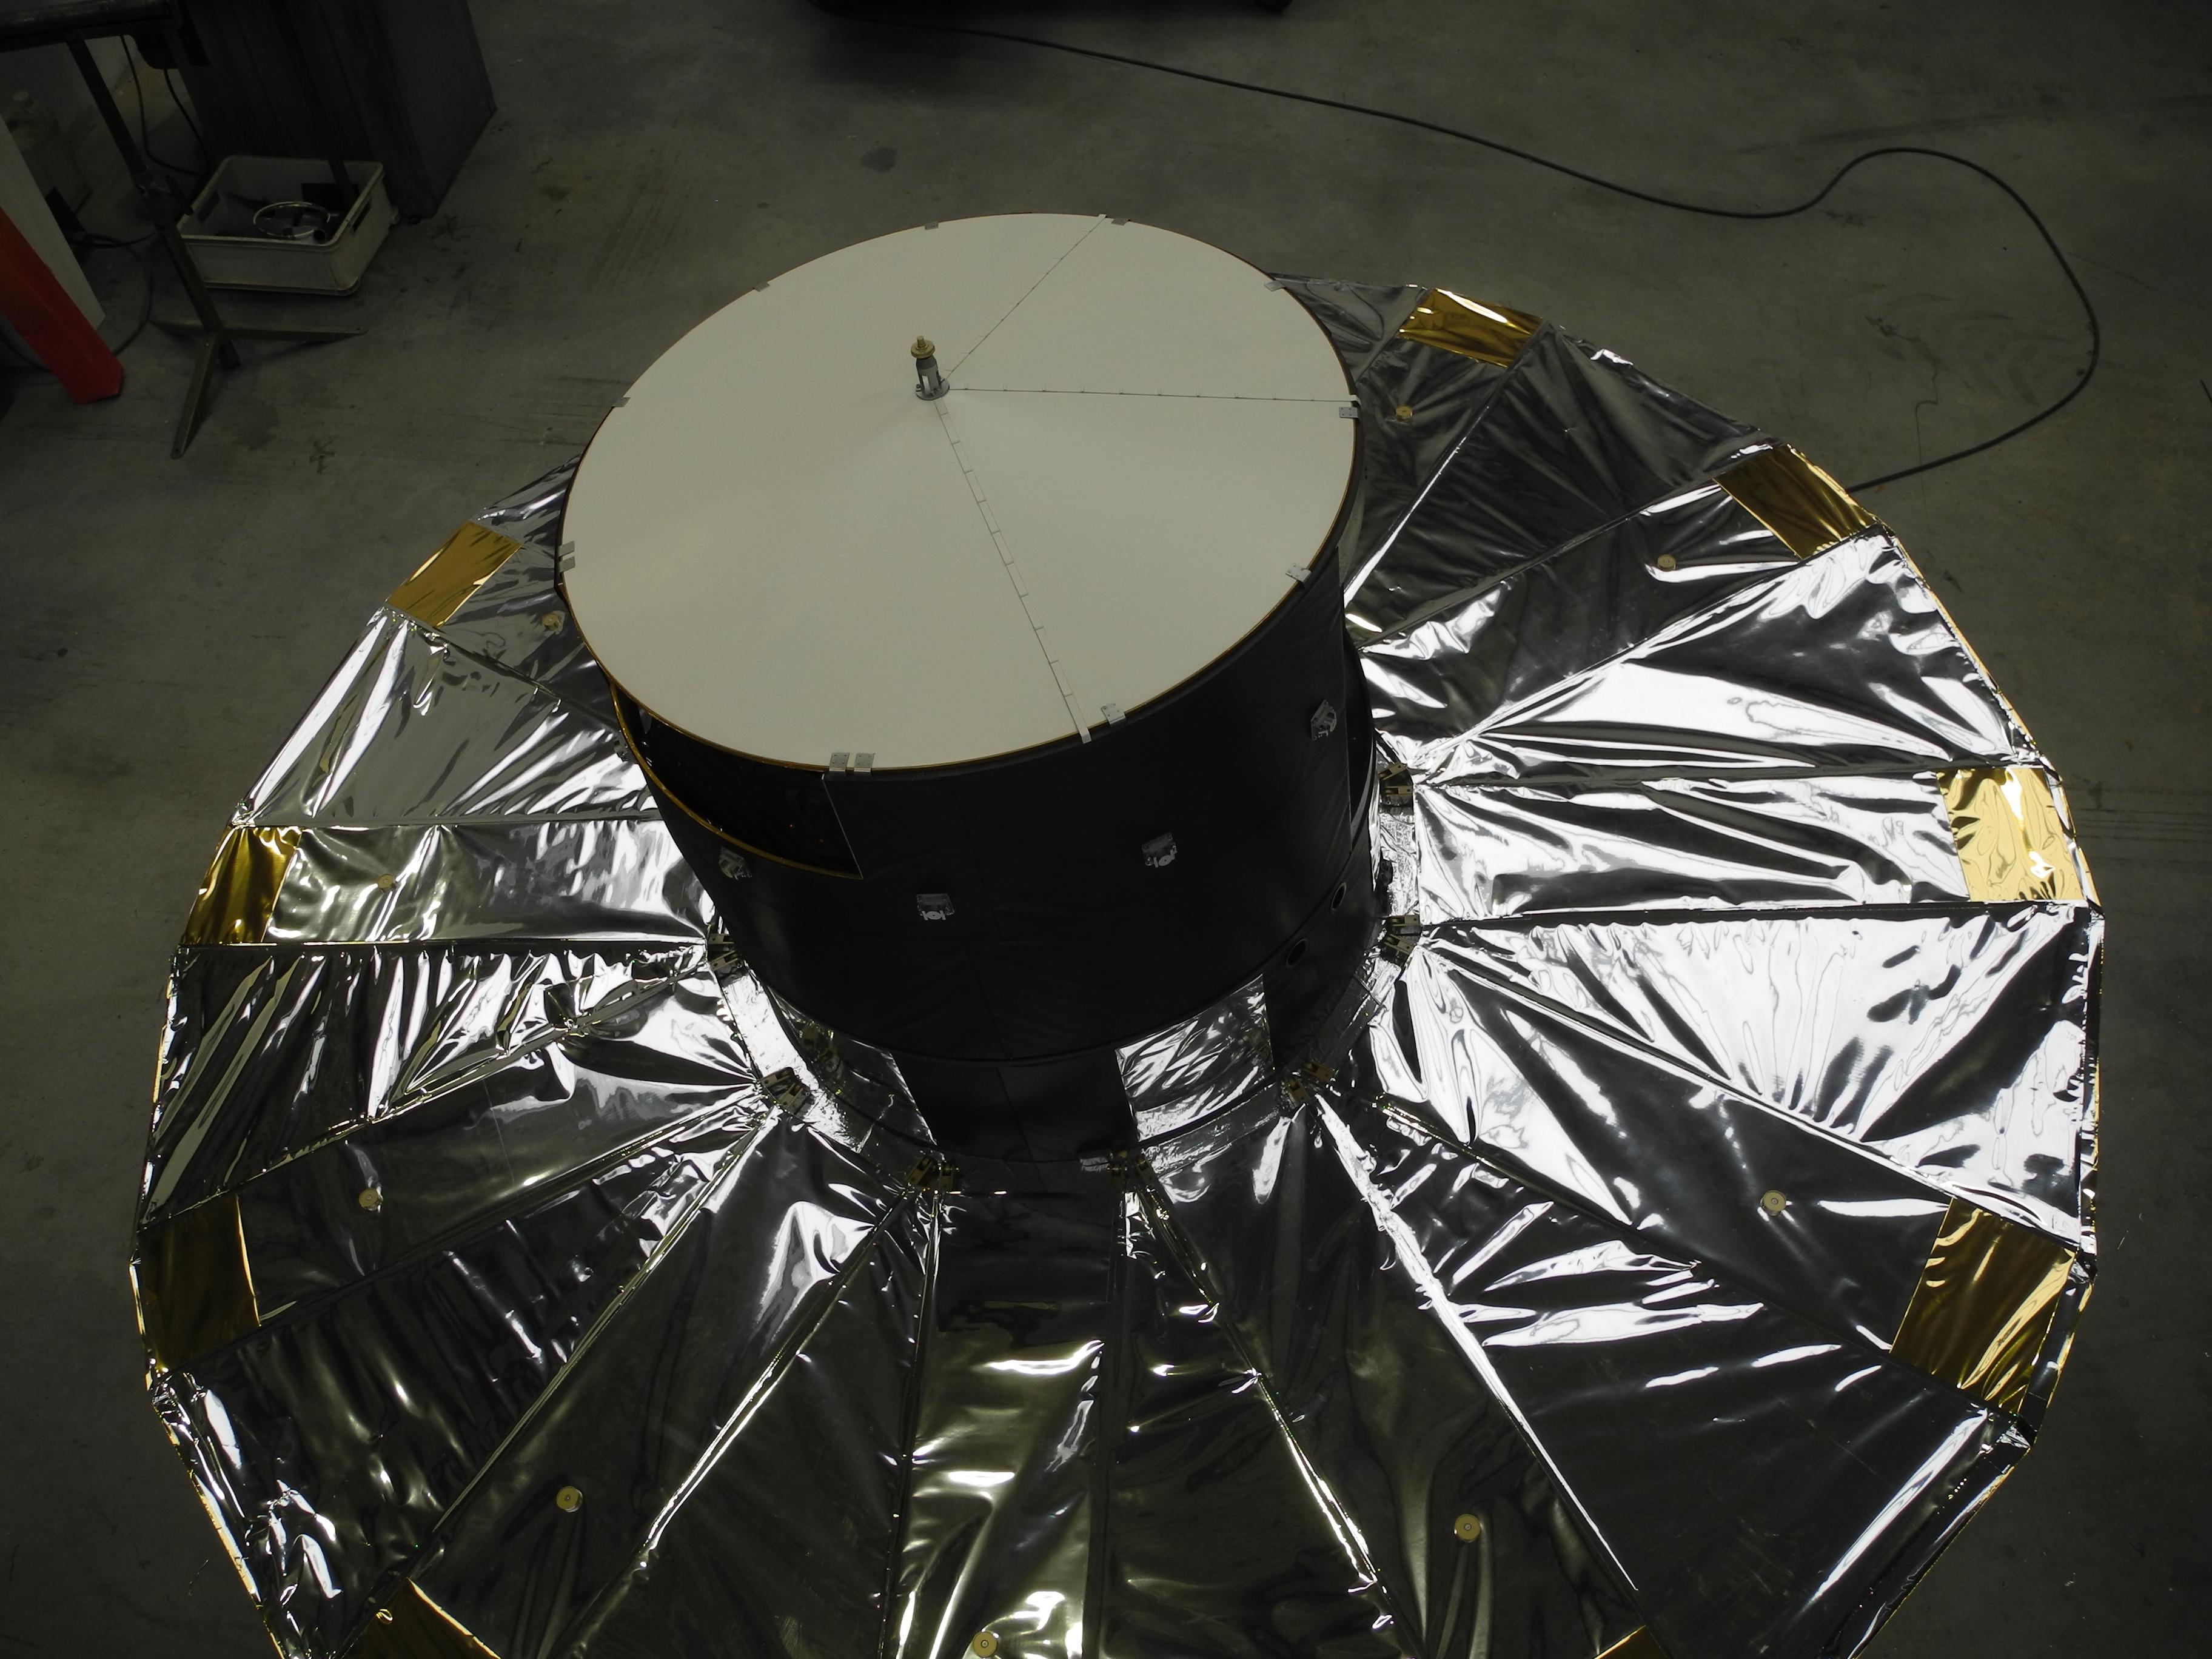 Gaia 1:4 space satellite model